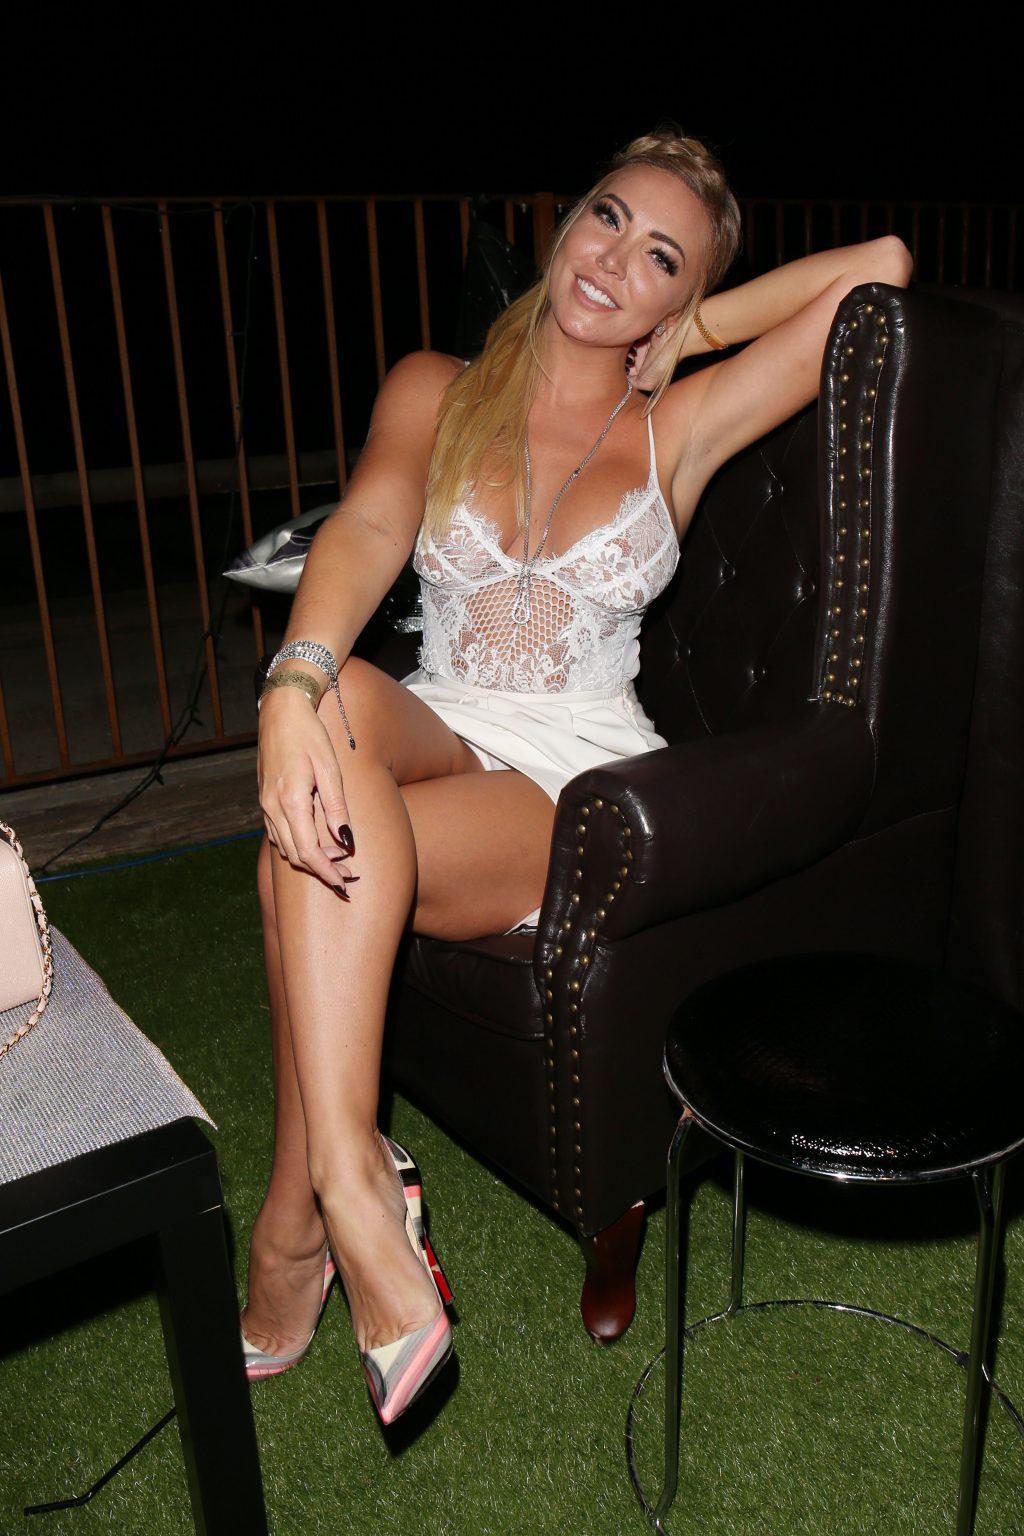 Michaela Mendez nude (48 photos), Tits, Hot, Twitter, see through 2015